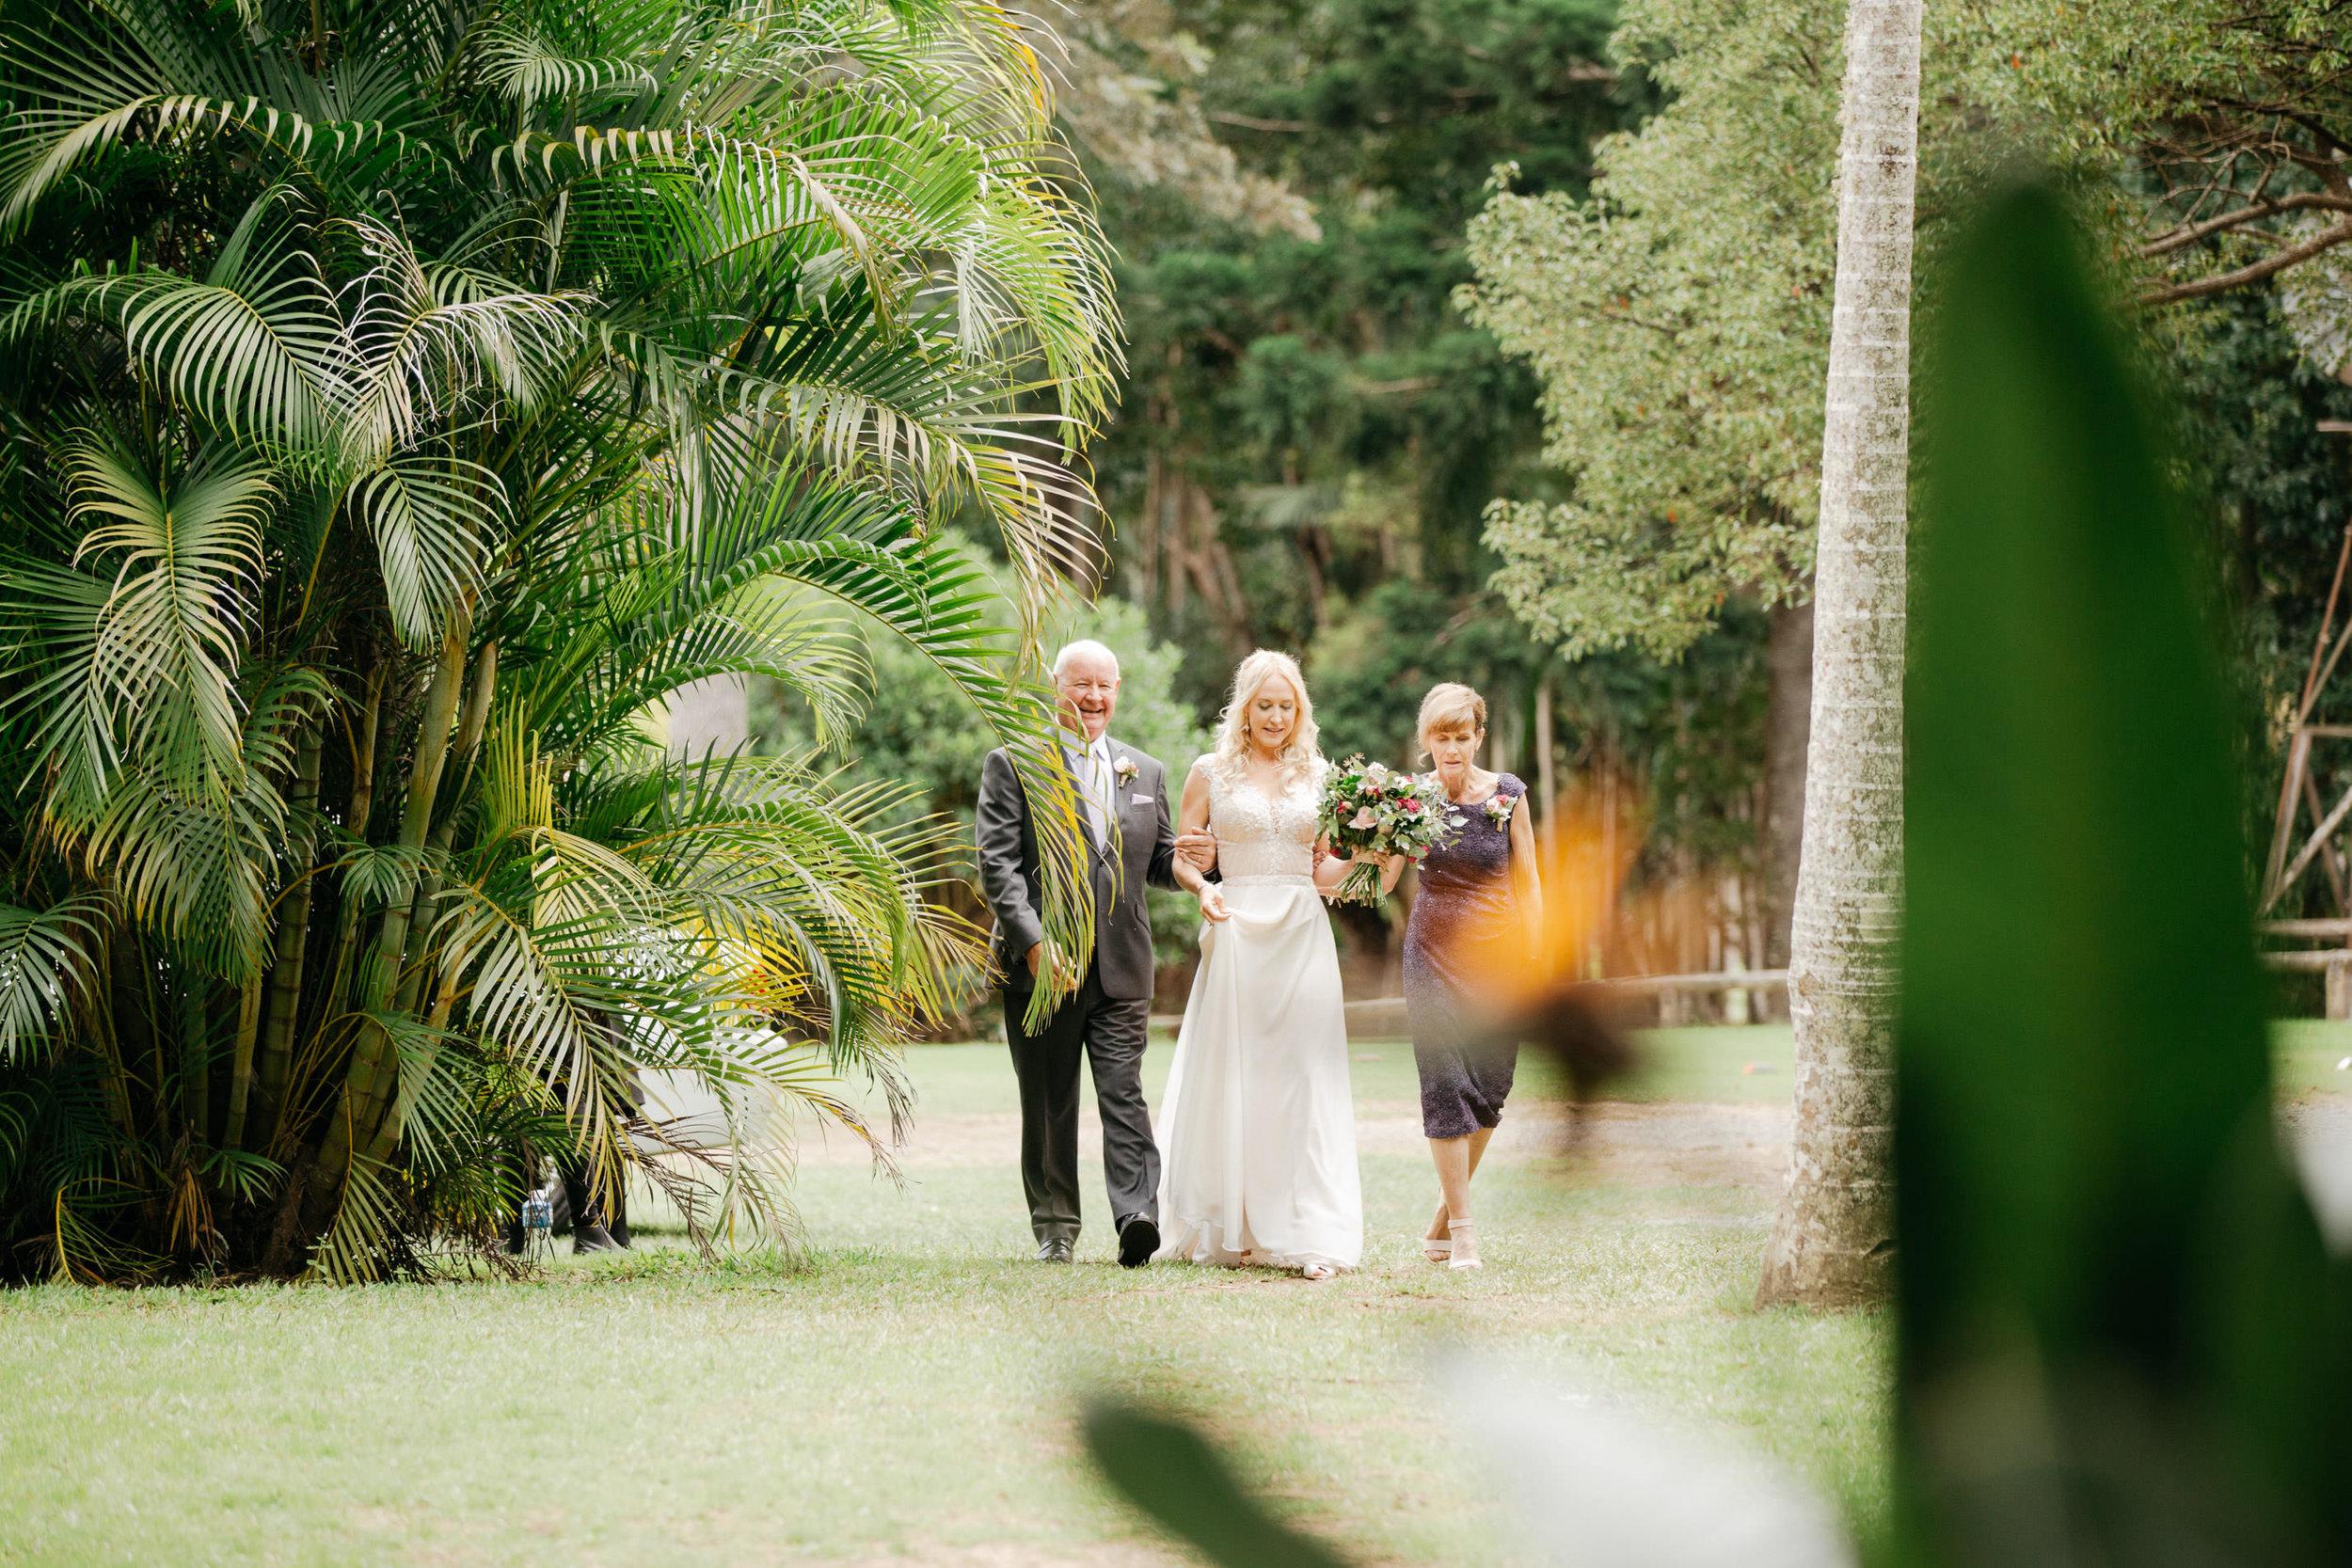 True North Photography_Boomerang Farm_Stacey and Isaac_Gold Coast Wedding_Barm Wedding_Hinterland Wedding-75.jpg